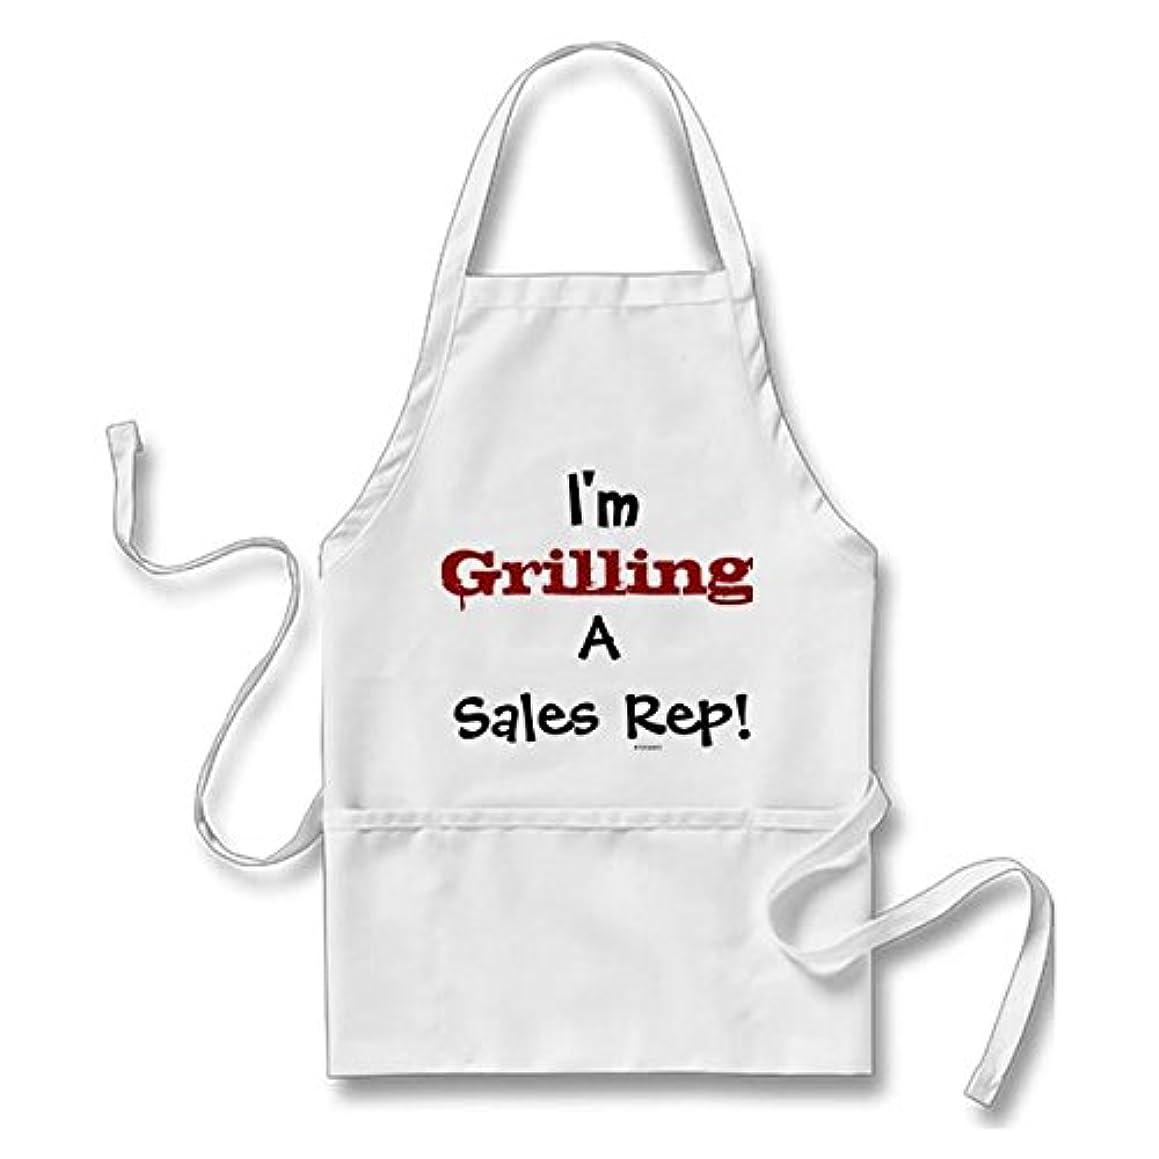 Grilling A Sales Rep Cruel Doctor Joke Long Apron for Men Women with Pockets